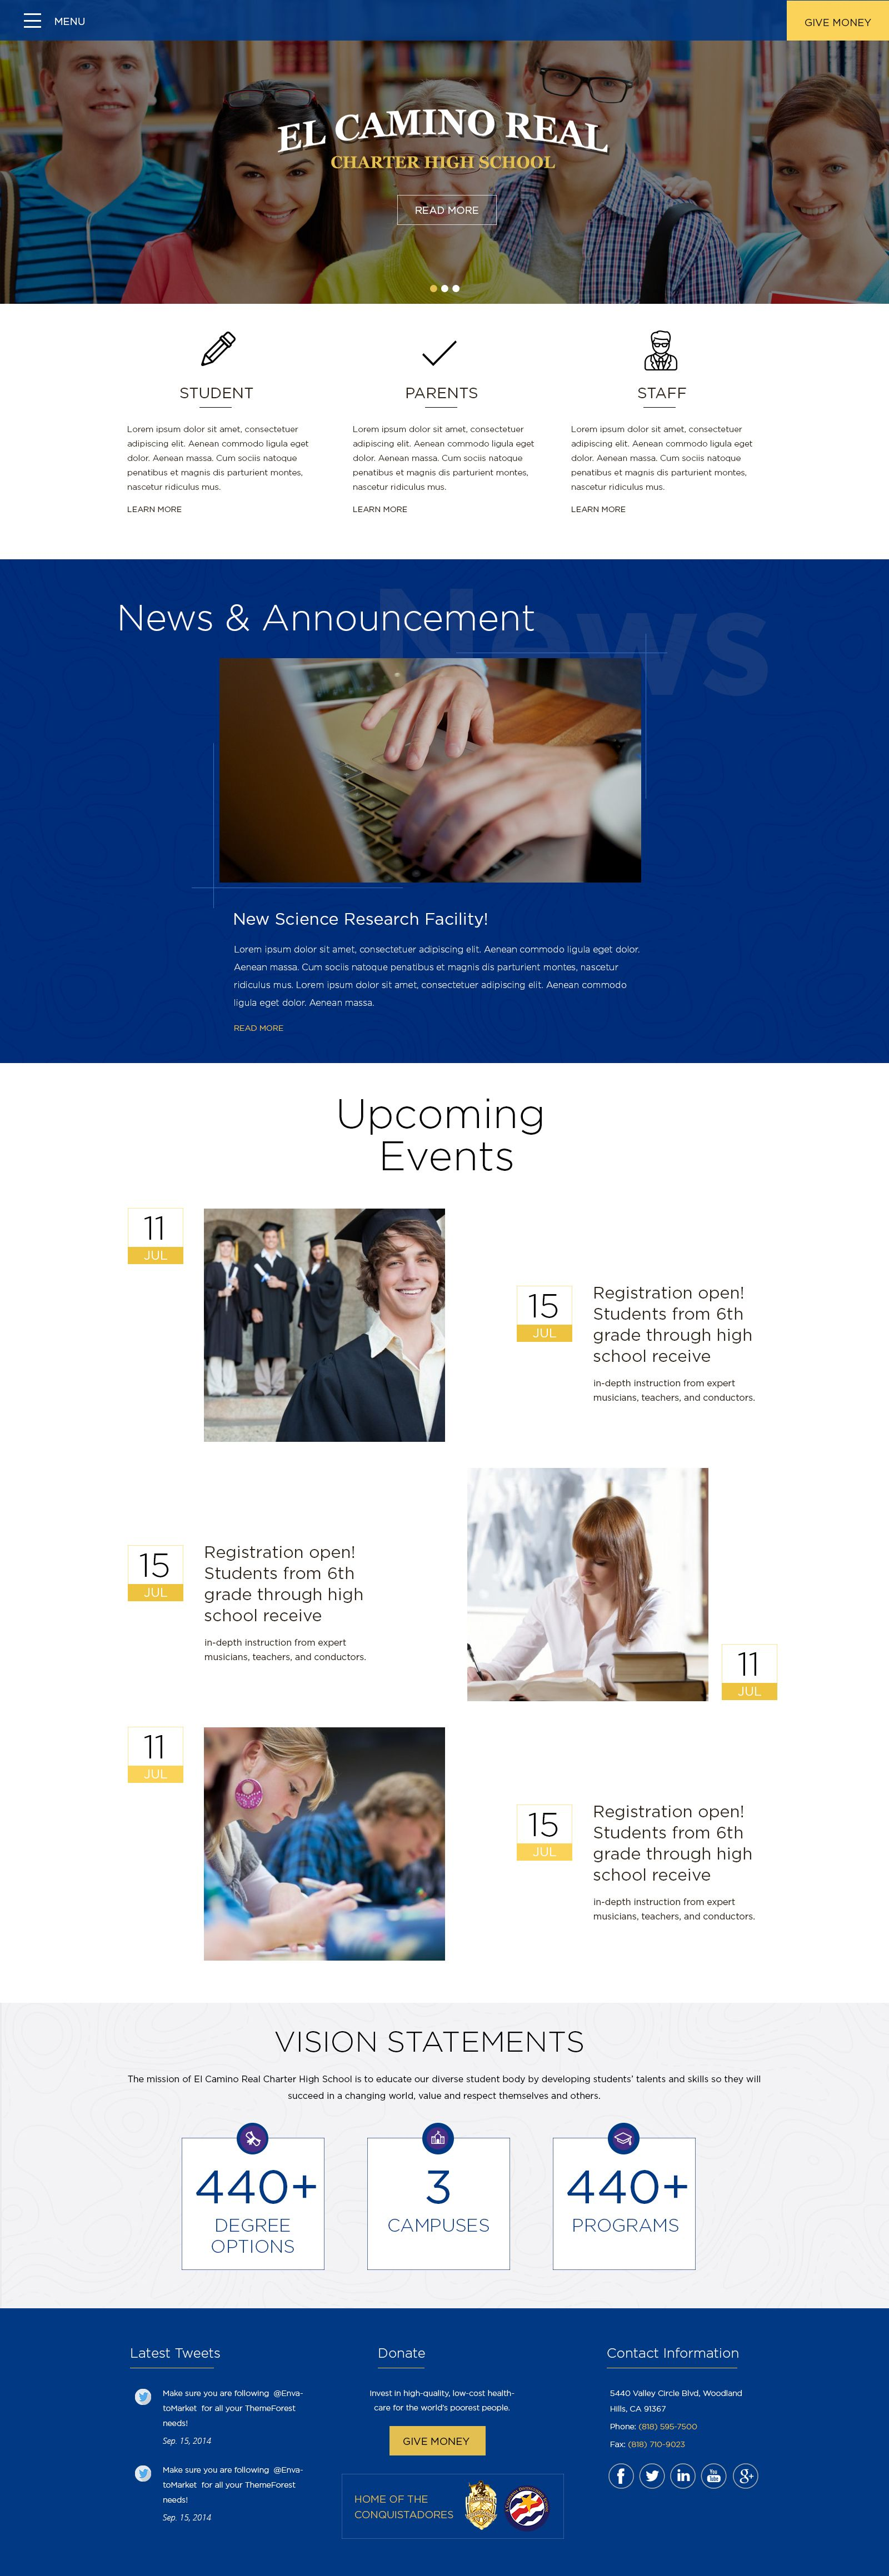 Professional Website Design Ideas